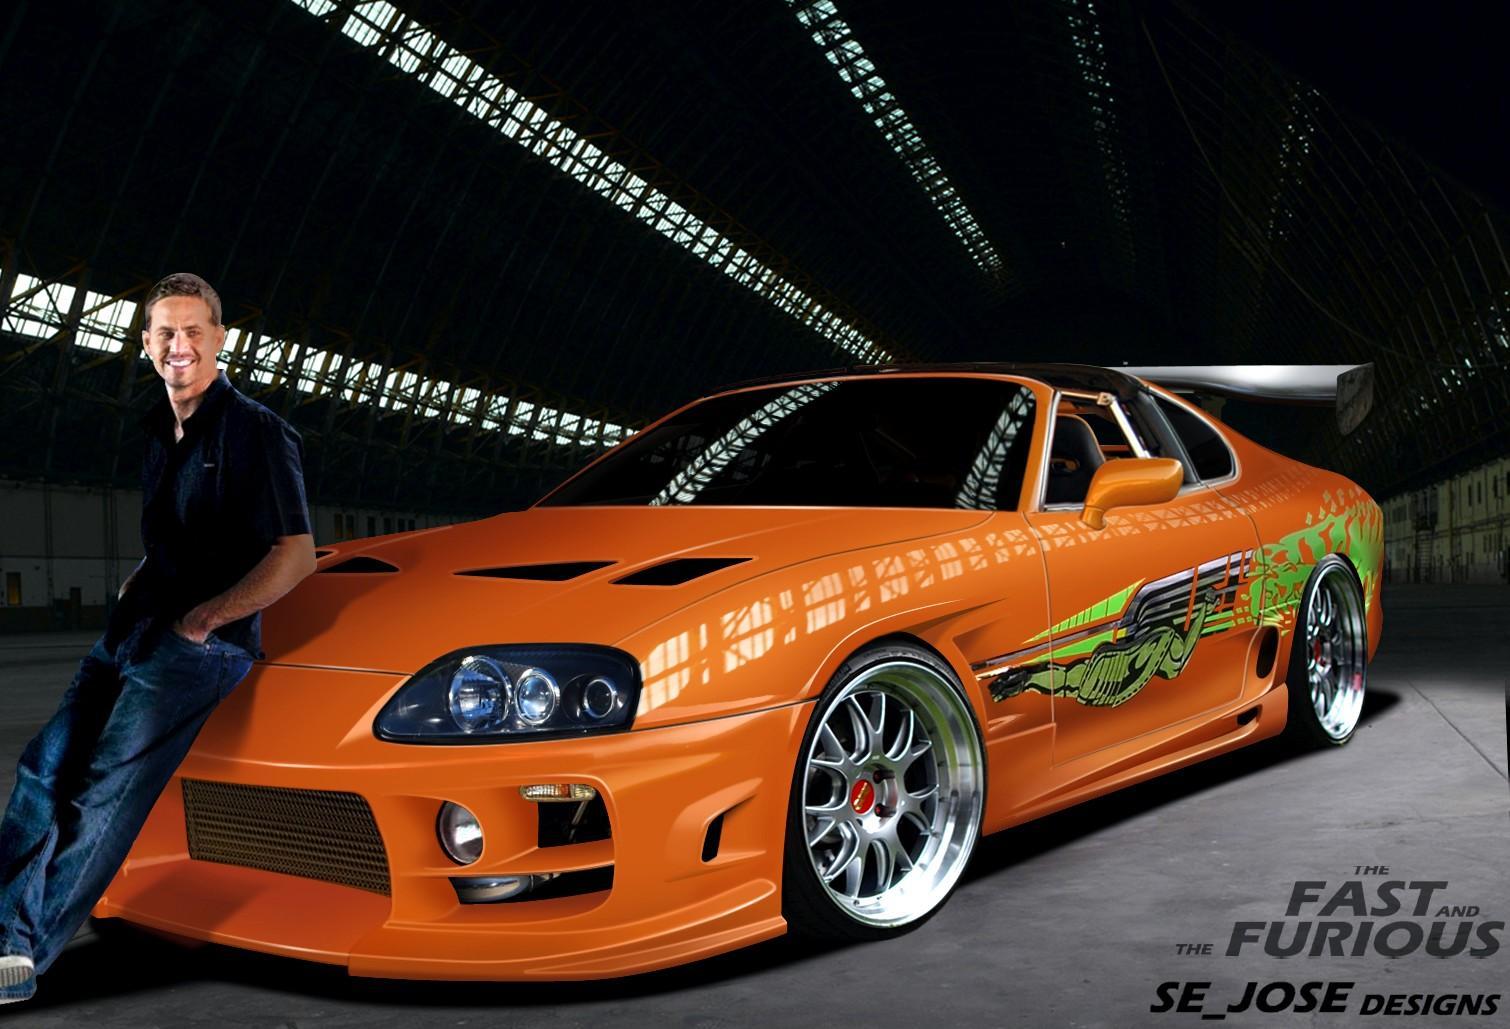 2020 Toyota Supra Wallpapers - Wallpaper Cave  |New Toyota Supra Wallpaper